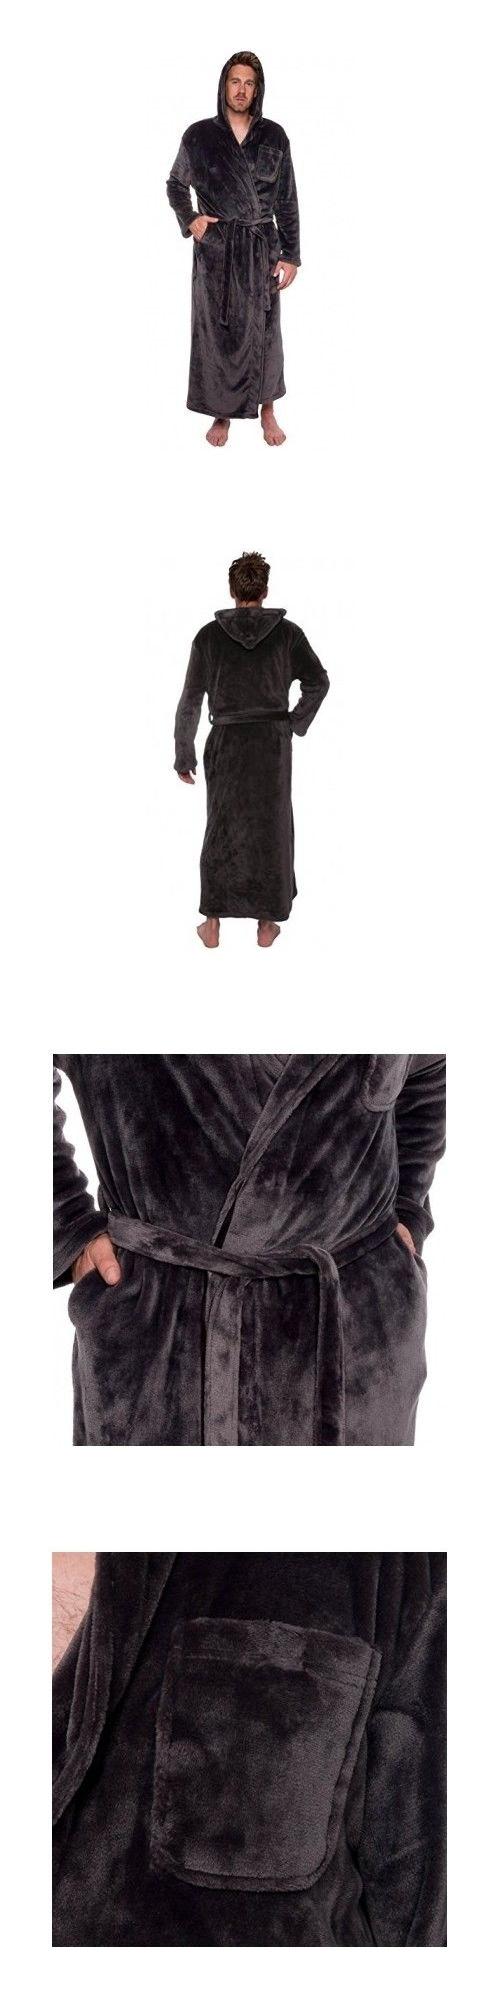 3f1f2fcde3 Sleepwear and Robes 11510  Men S Gray Hooded Bathrobe 3Xl Soft Plush Full  Length 59